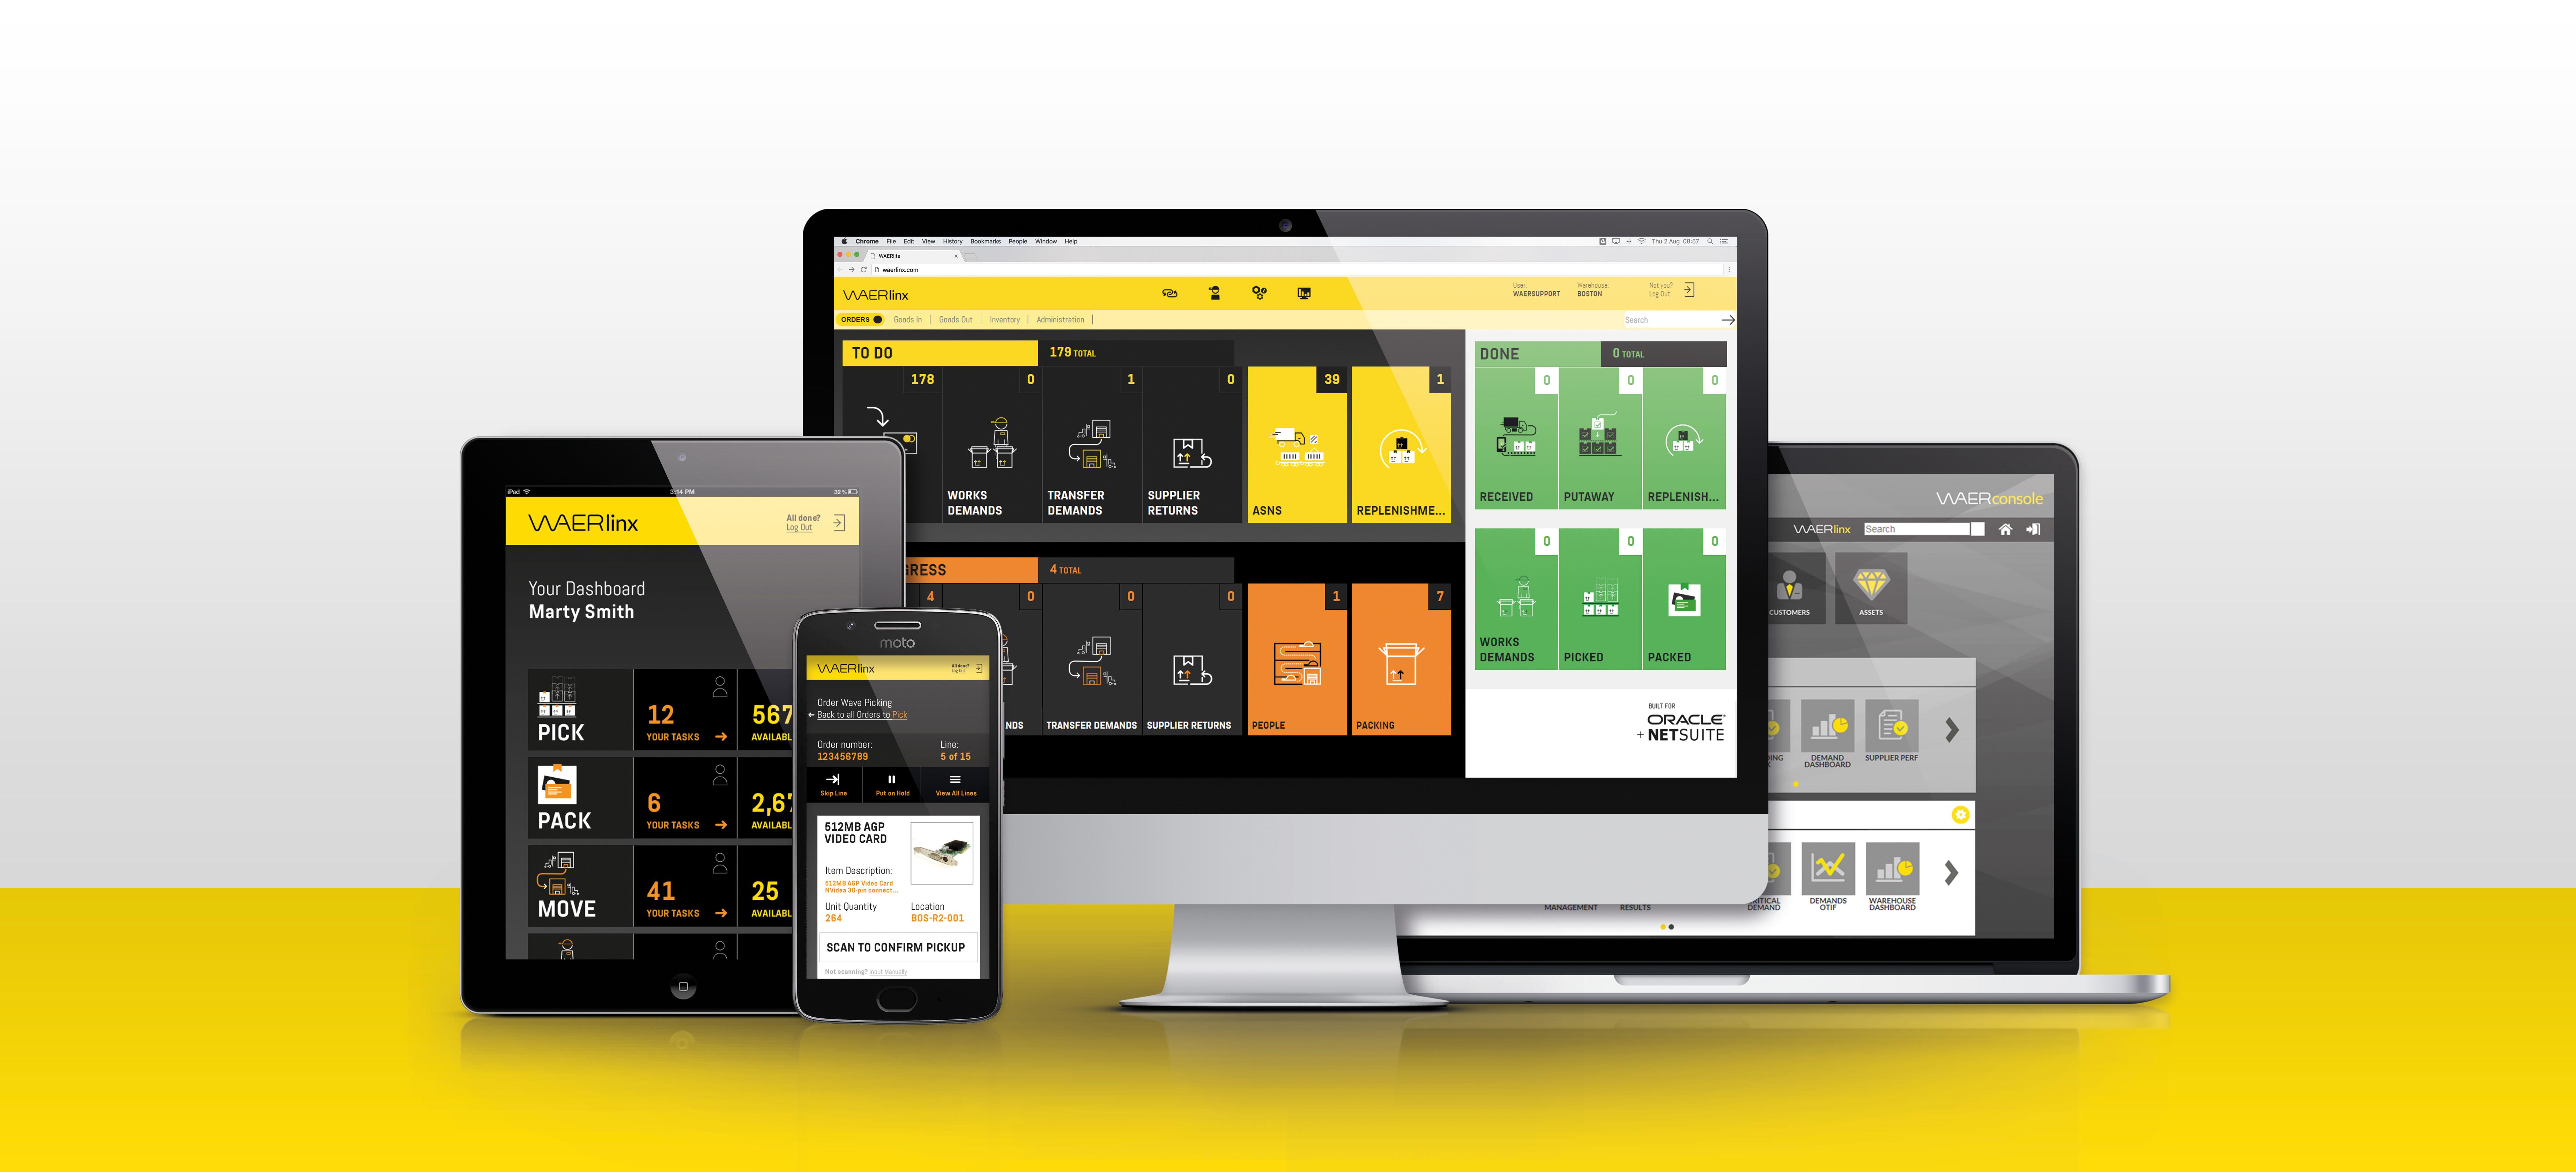 Warehouse Management NetSuite - WAERlinx